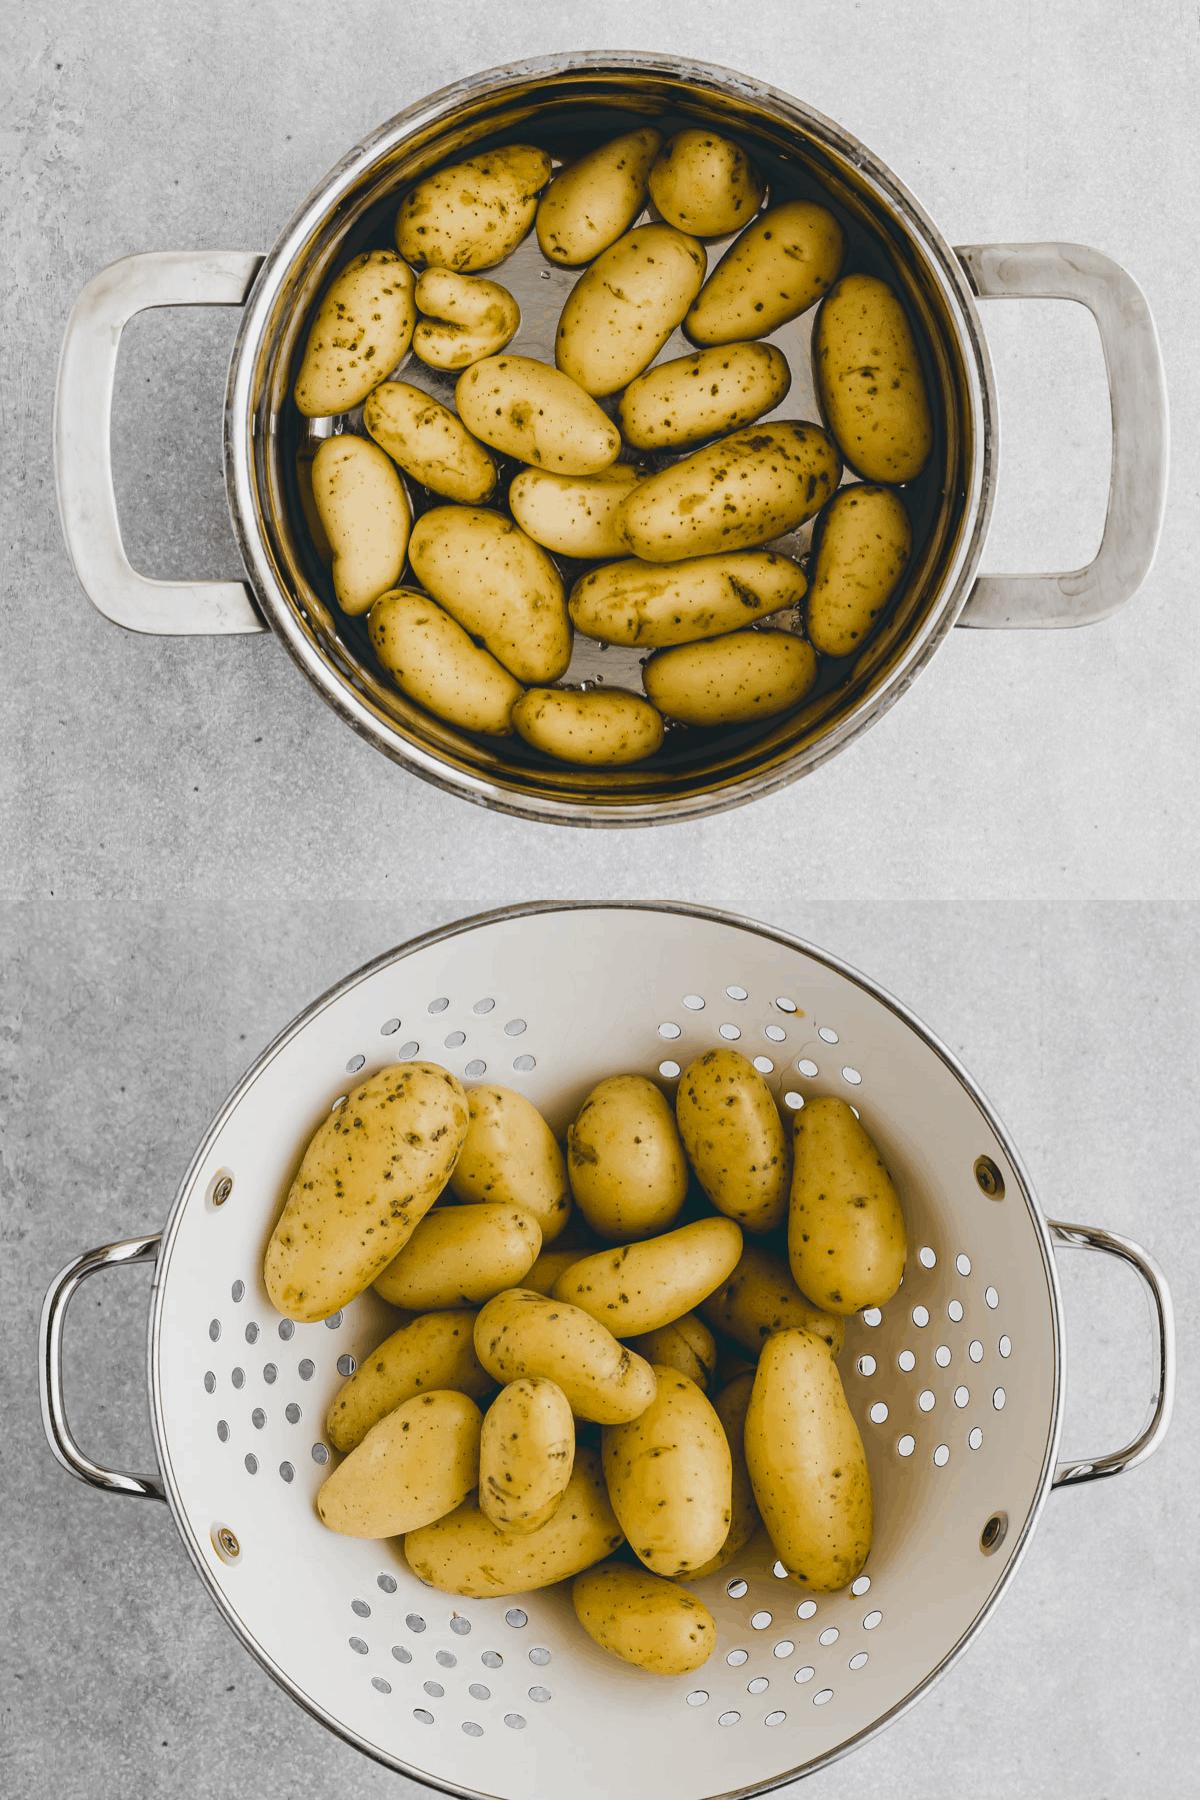 Smashed Potatoes Recipe Step 1-2